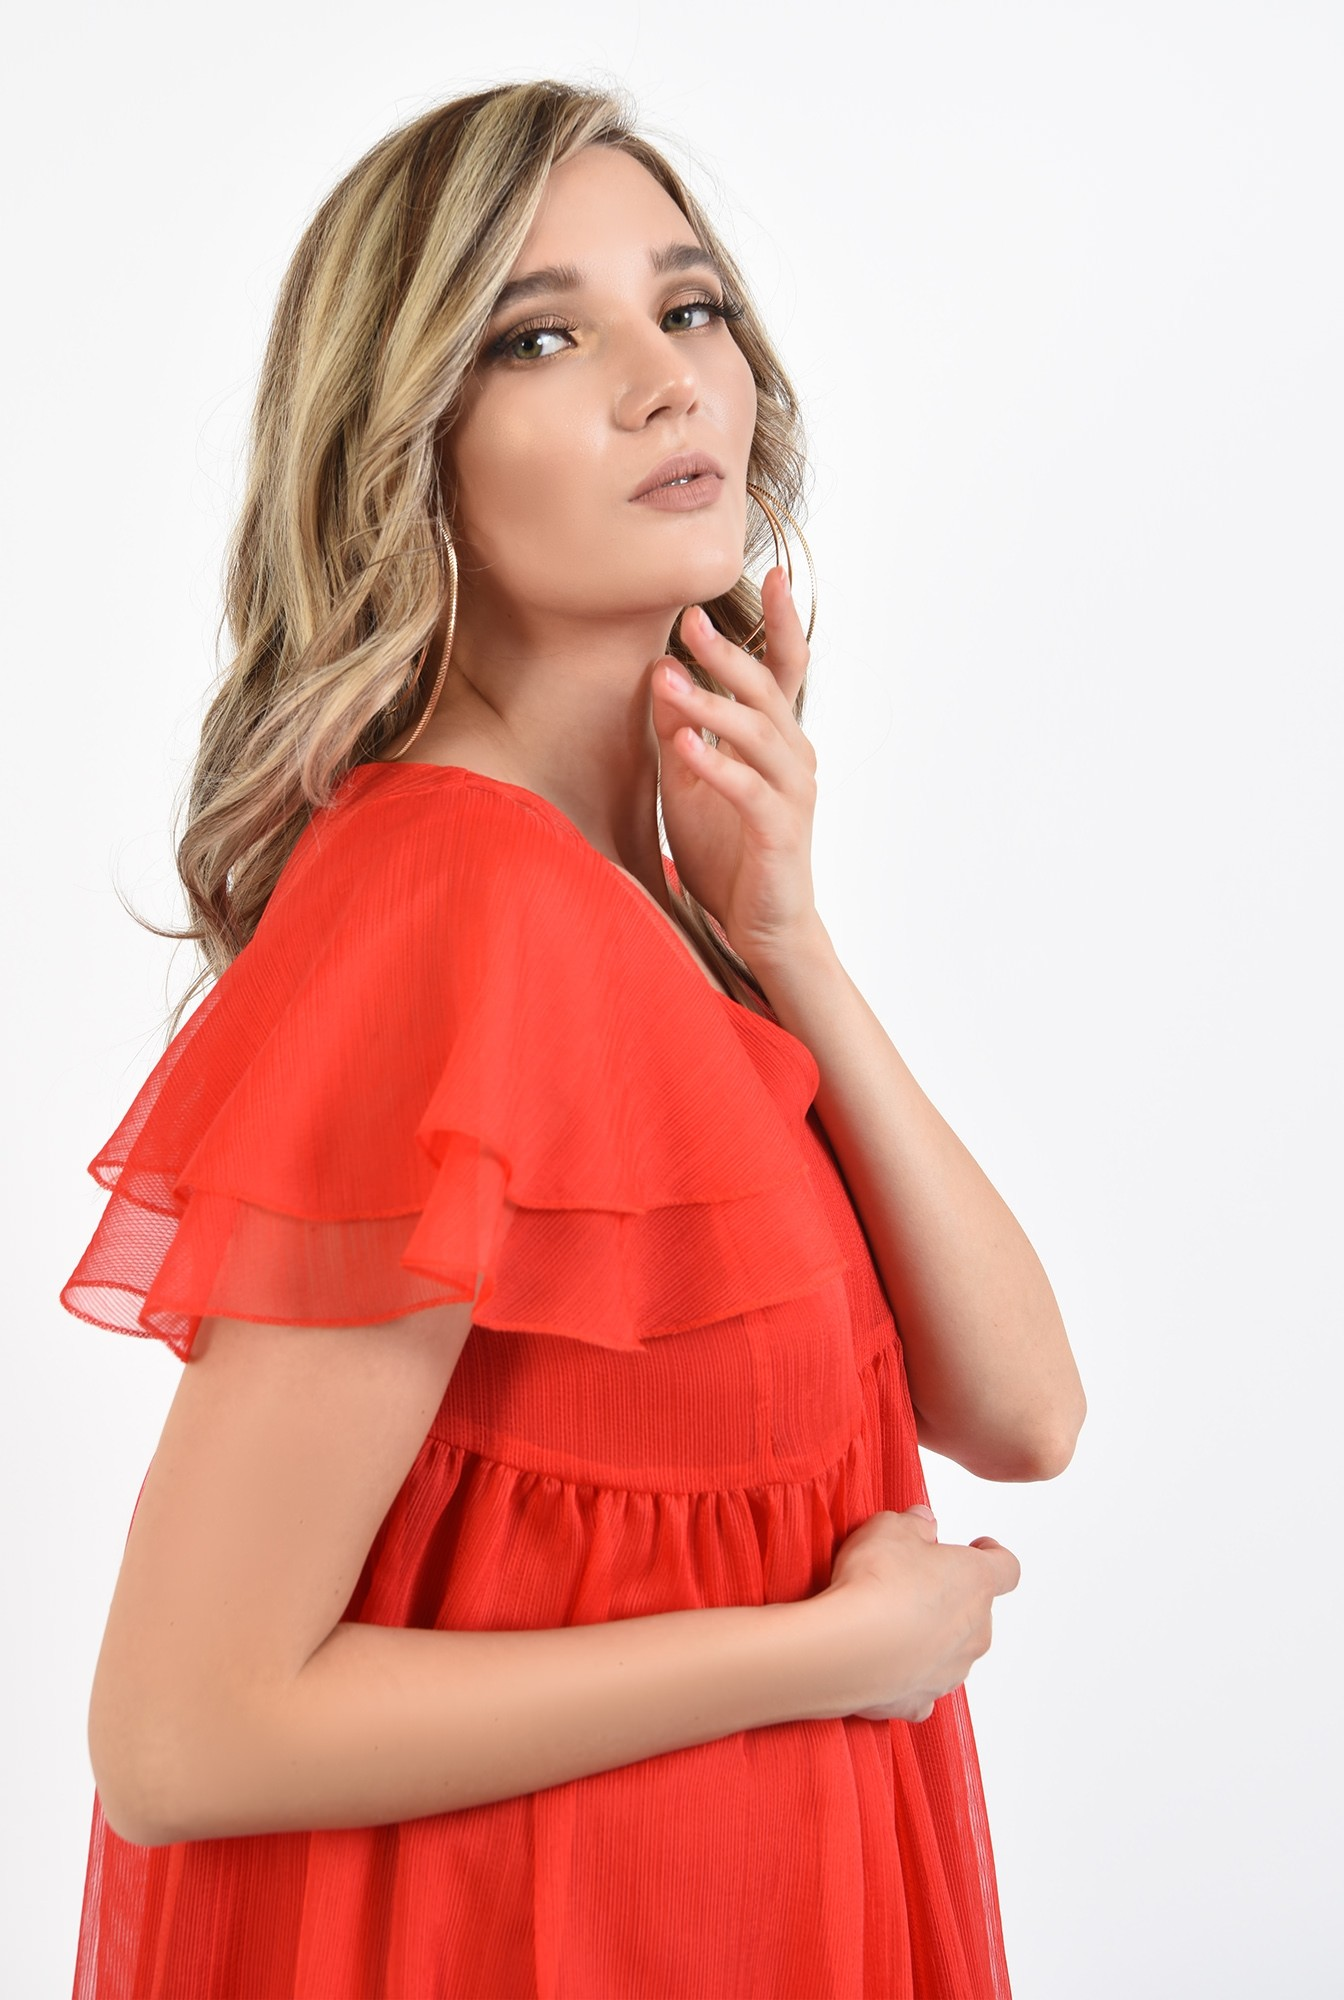 3 - 360 - rochie scurta, de vara, rosie, cu volane, Poema